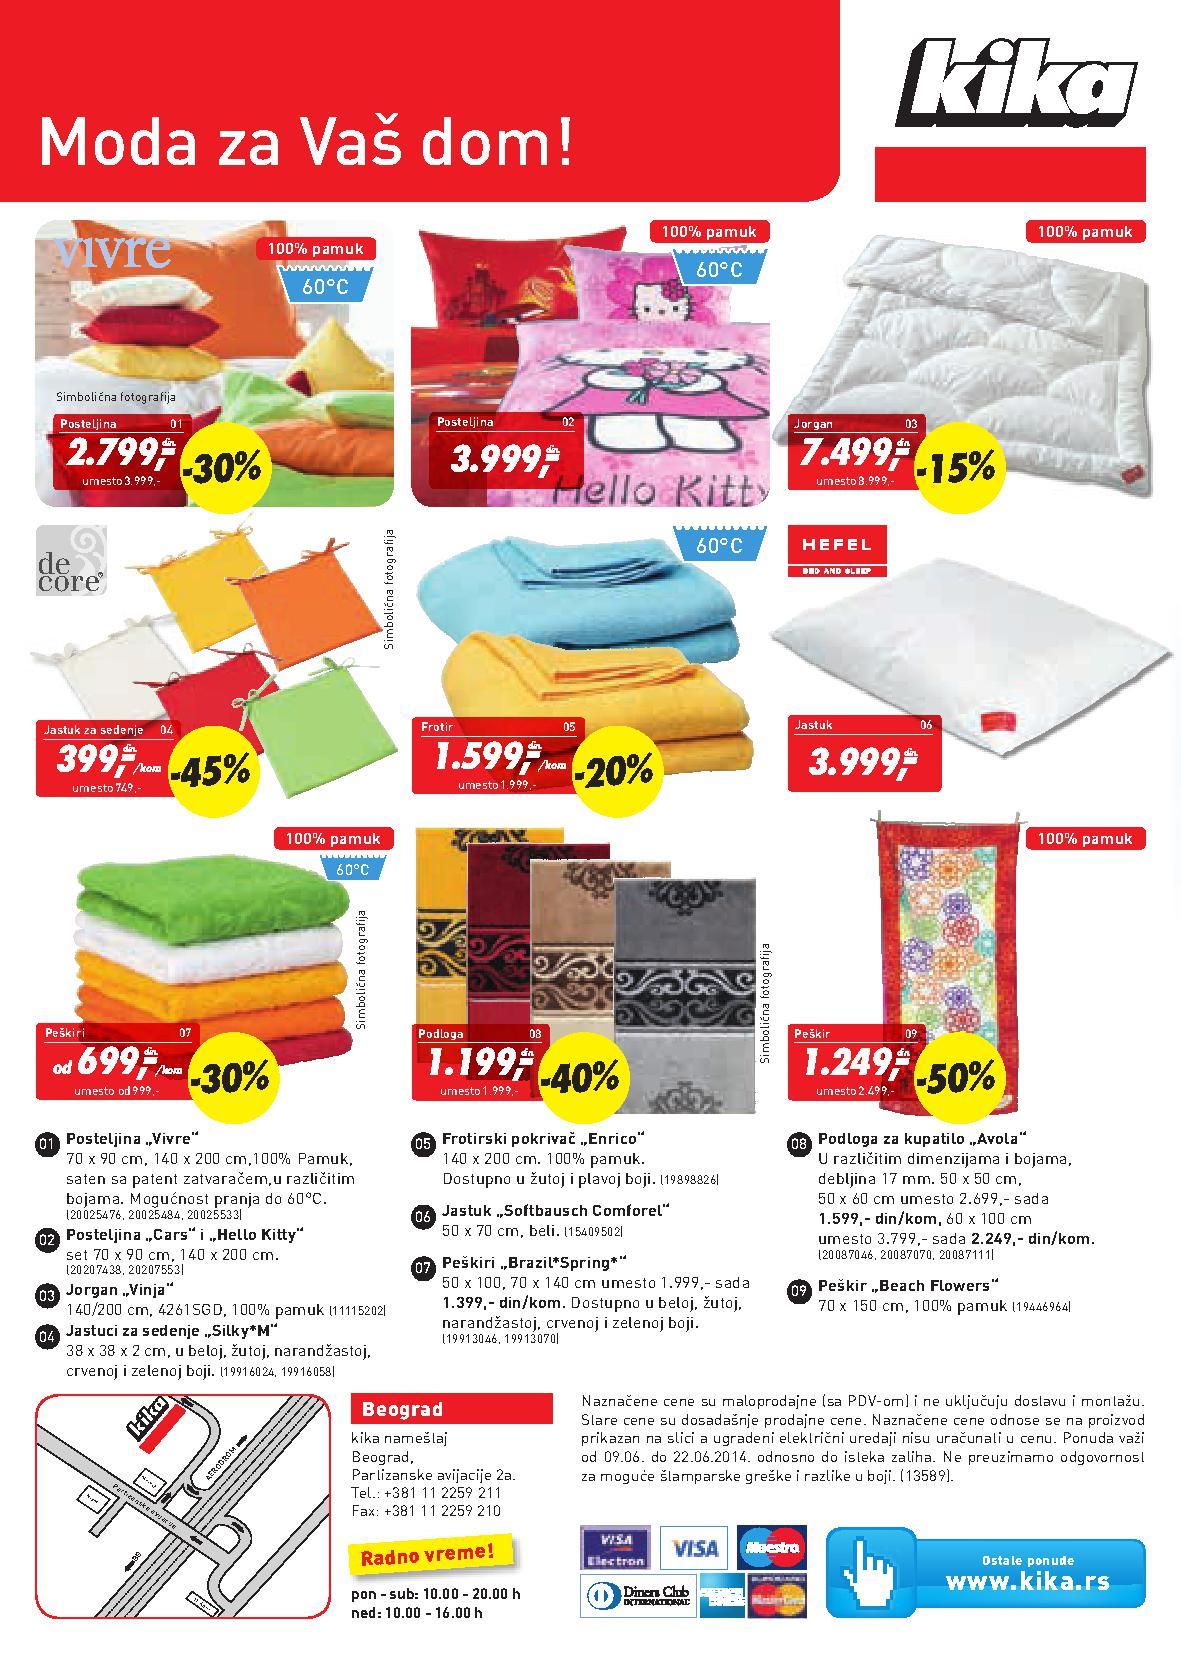 Kika akcija kućni tekstil po super ceni